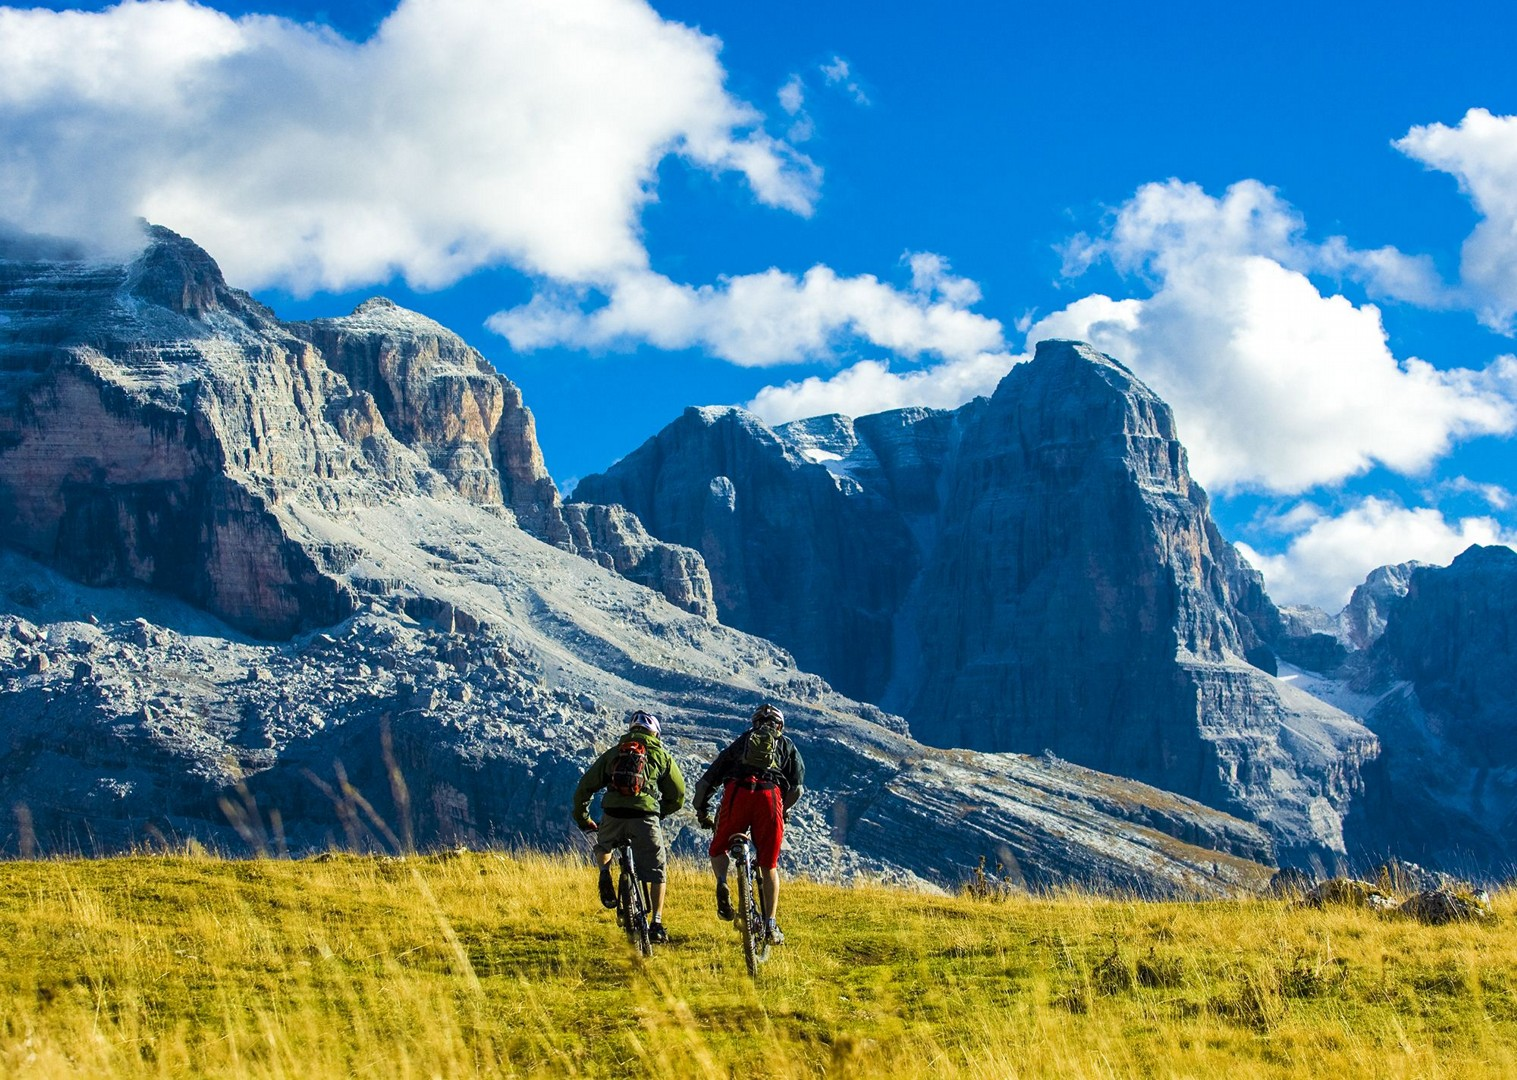 Brenta_Bike_2007_227-2.jpg - Italy - Dolomites of Brenta - Guided Mountain Bike Holiday - Mountain Biking